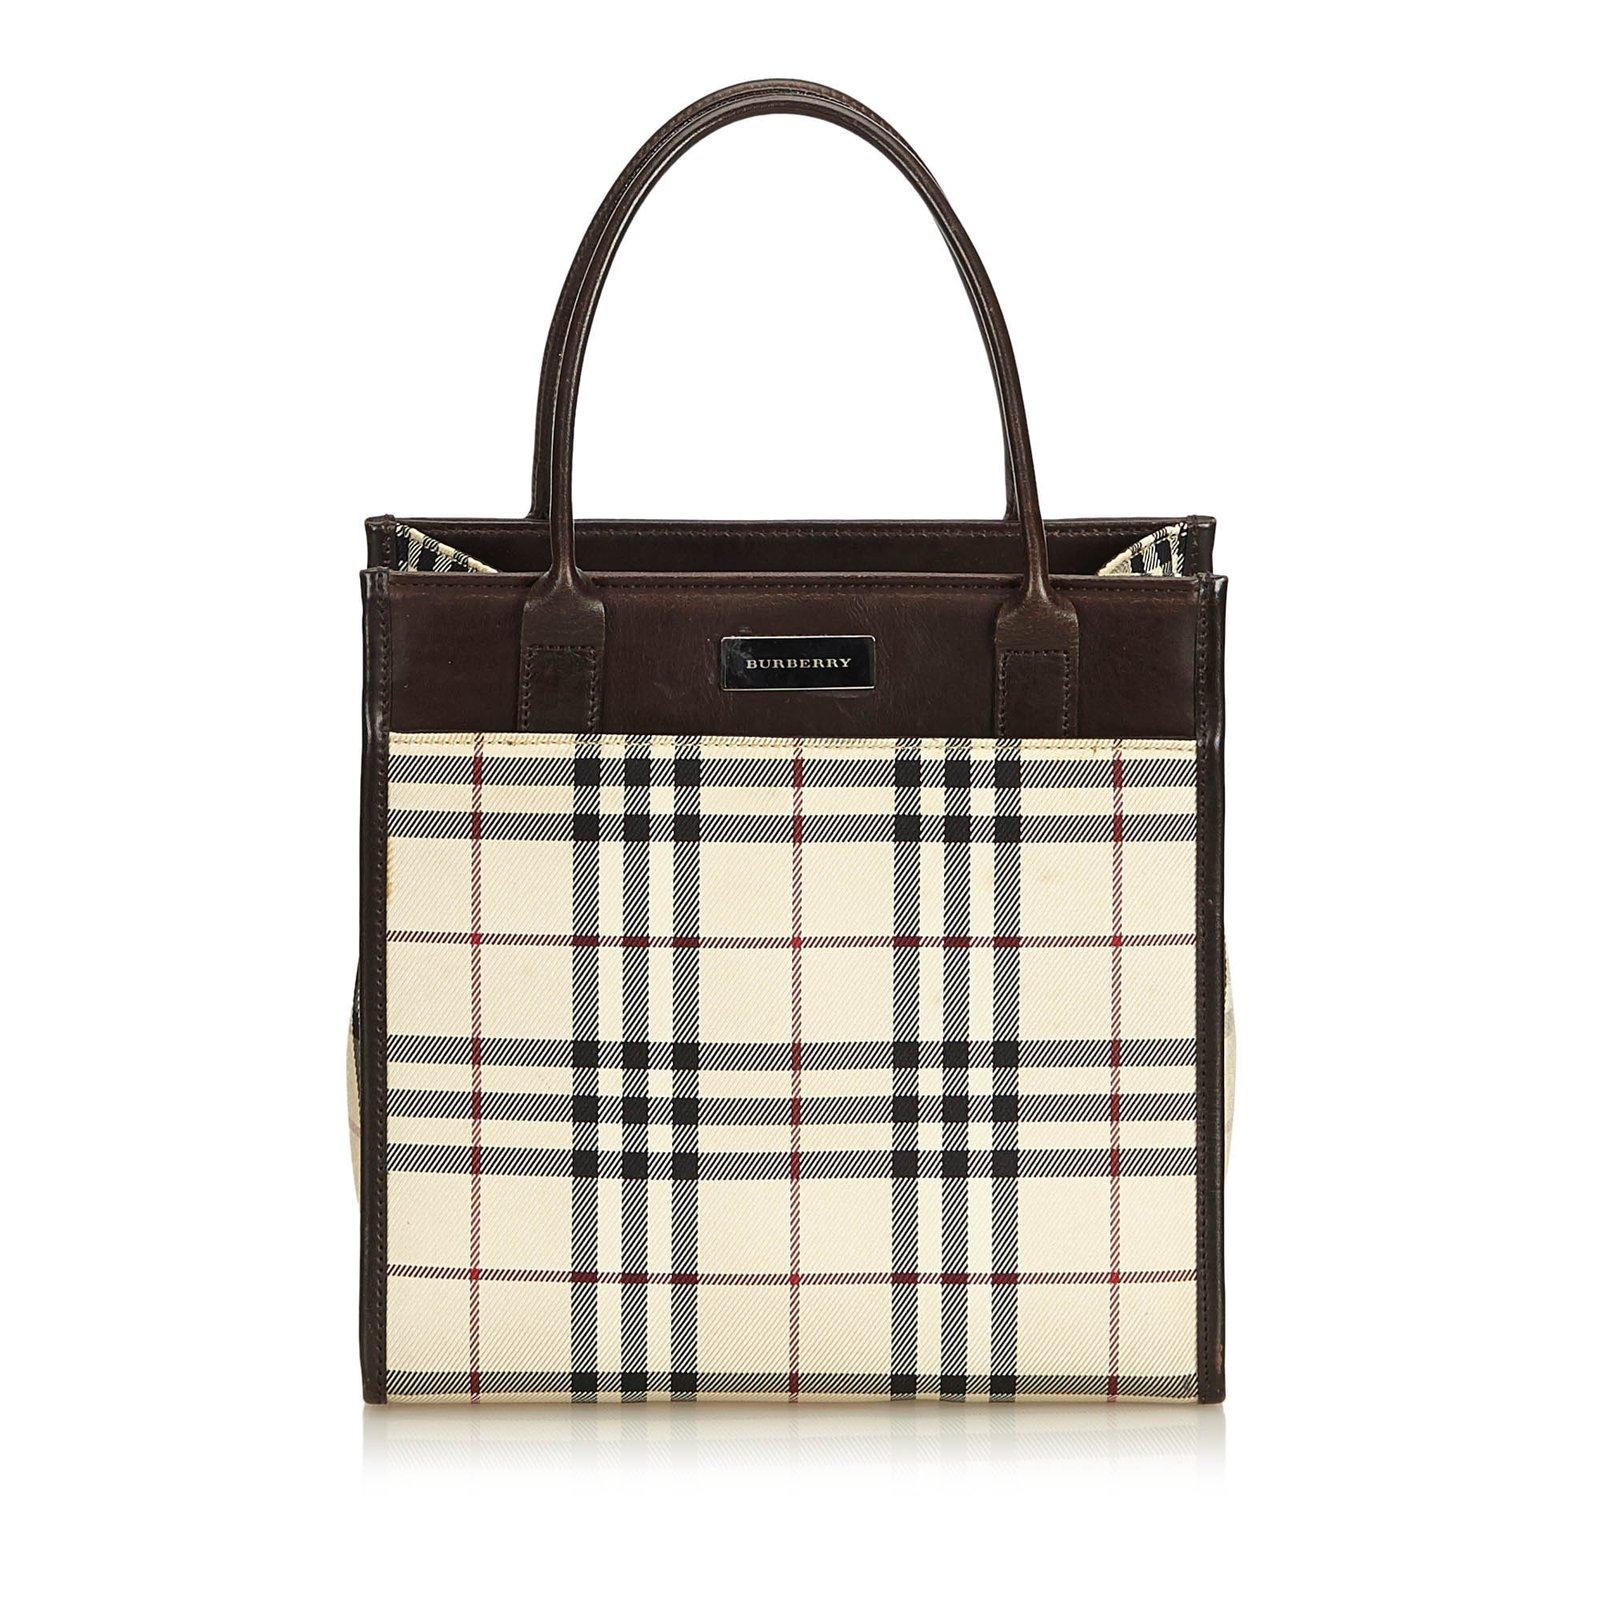 Burberry Plaid Coated Canvas Handbag Handbags Leather Other Cloth Brown Multiple